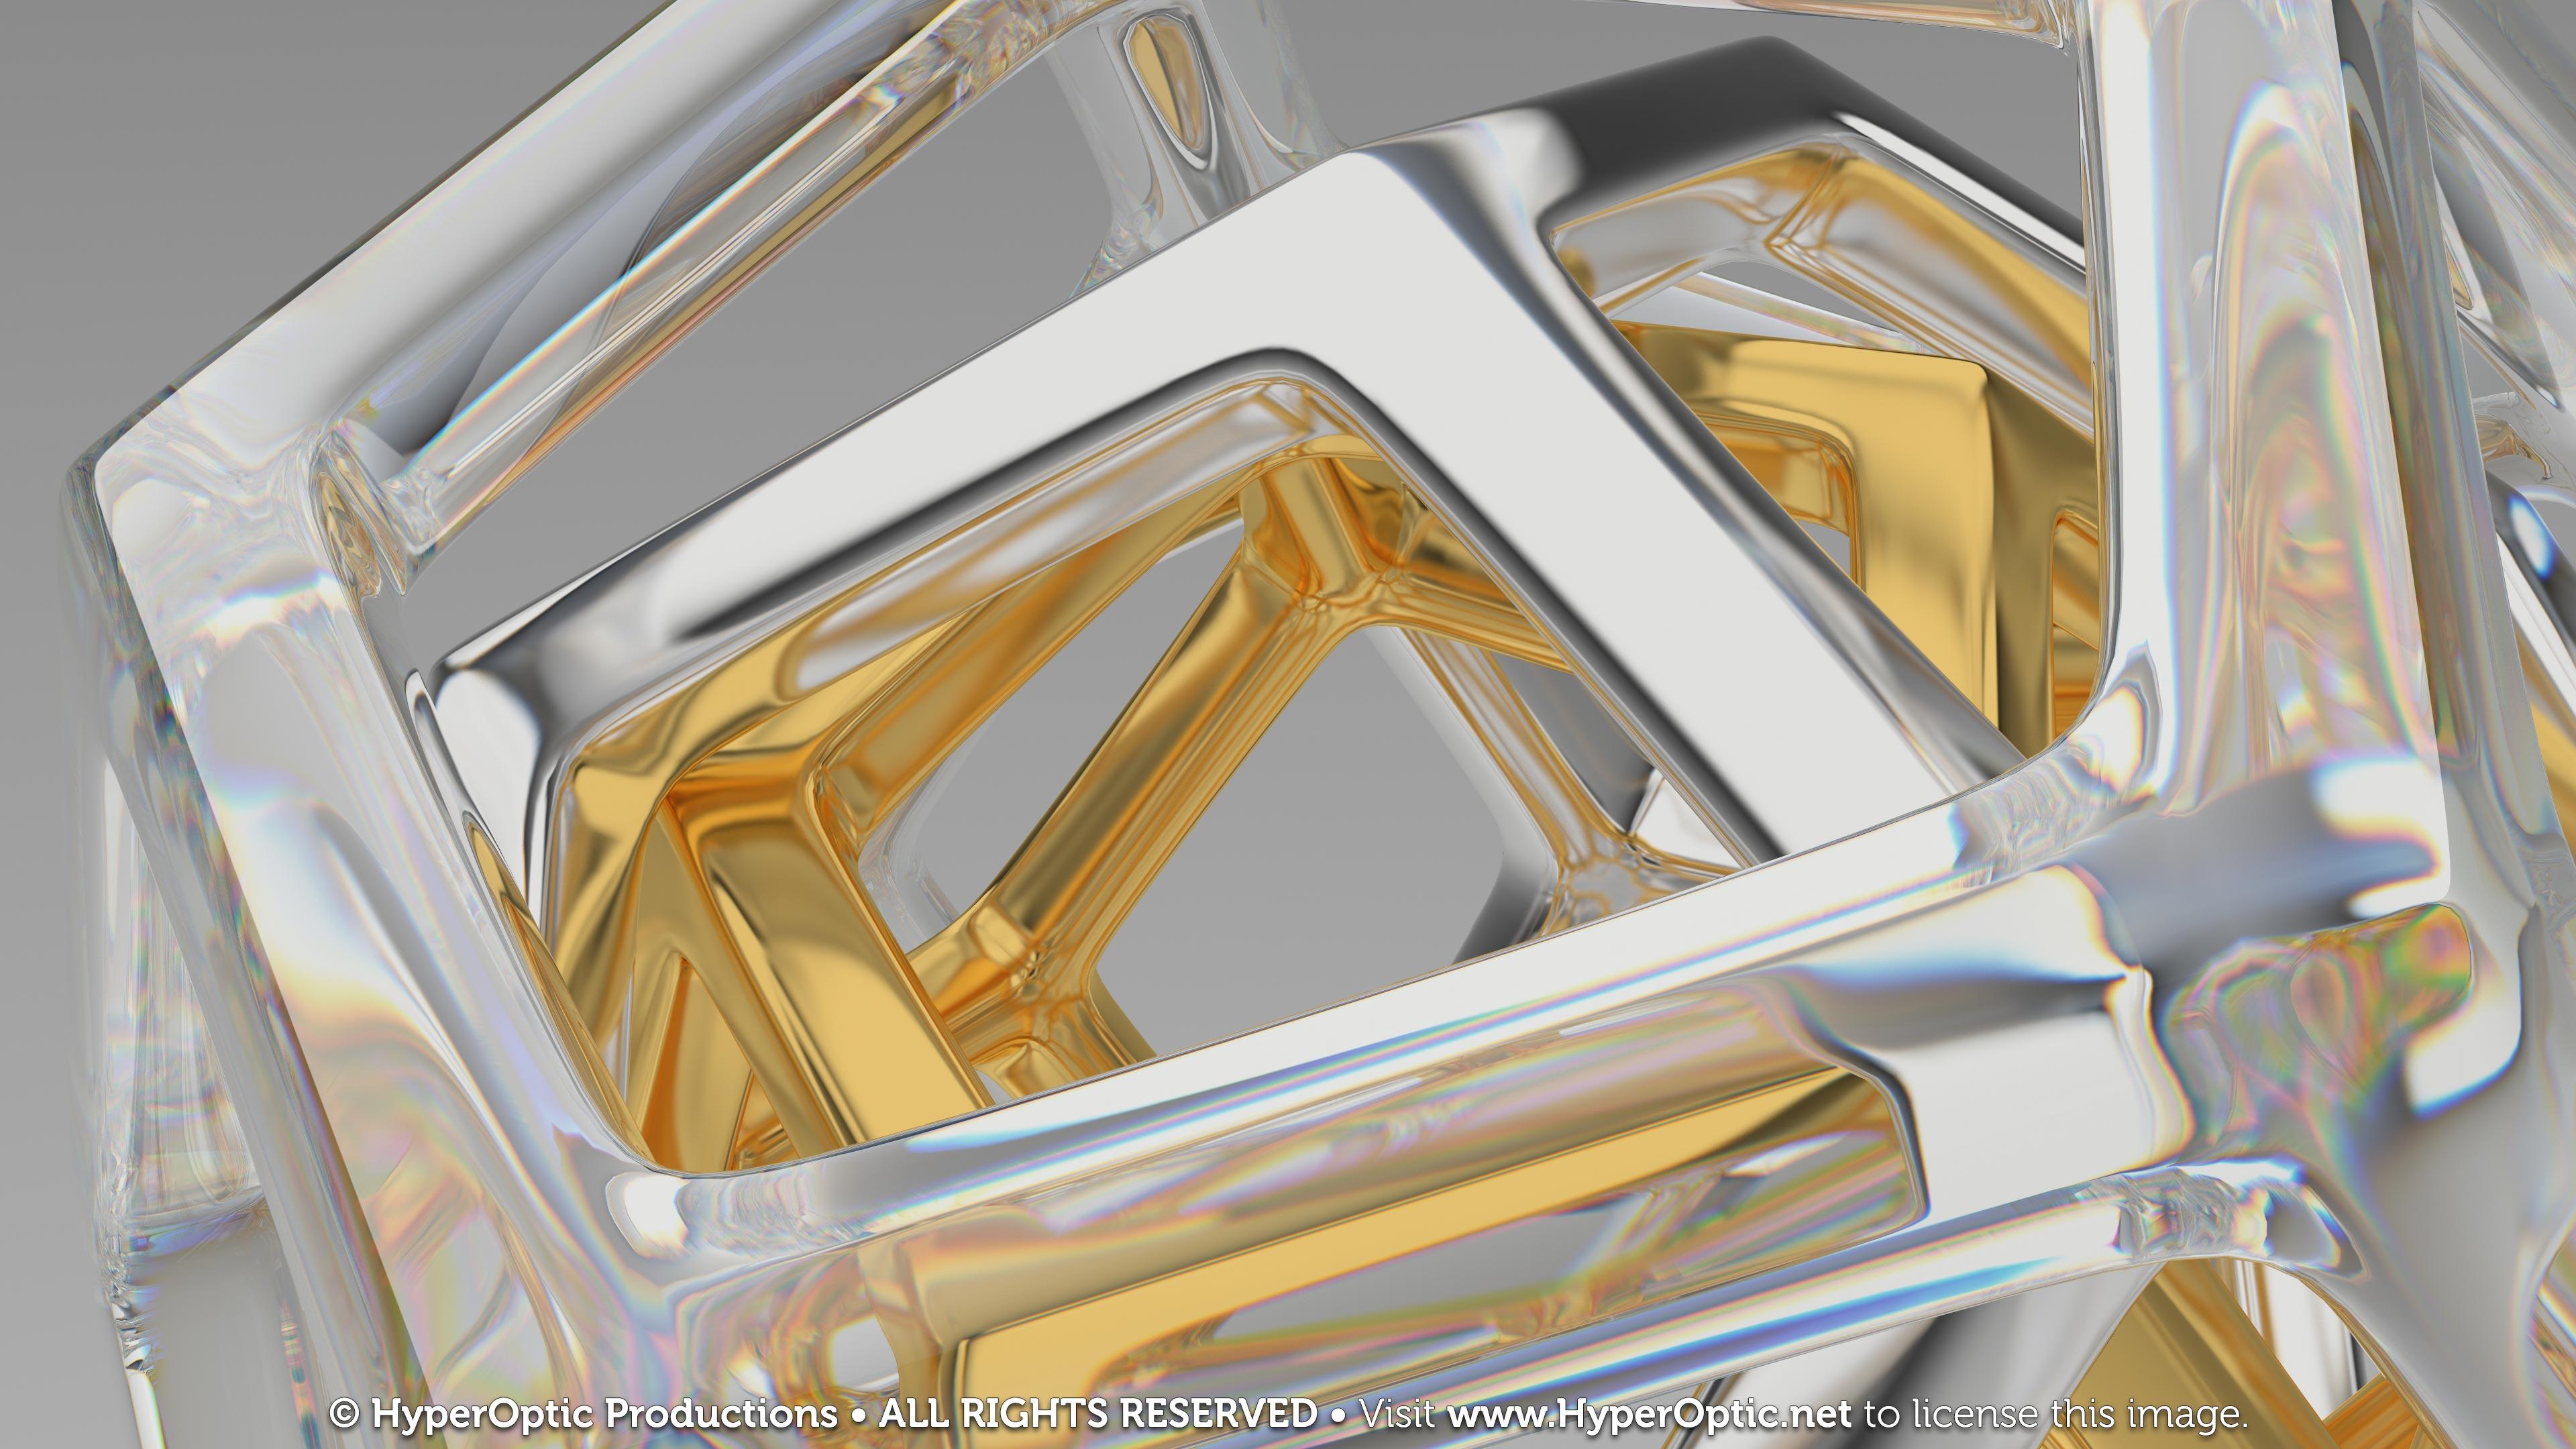 Crystal-Platinum-Gold-Dodecahedrons-4K